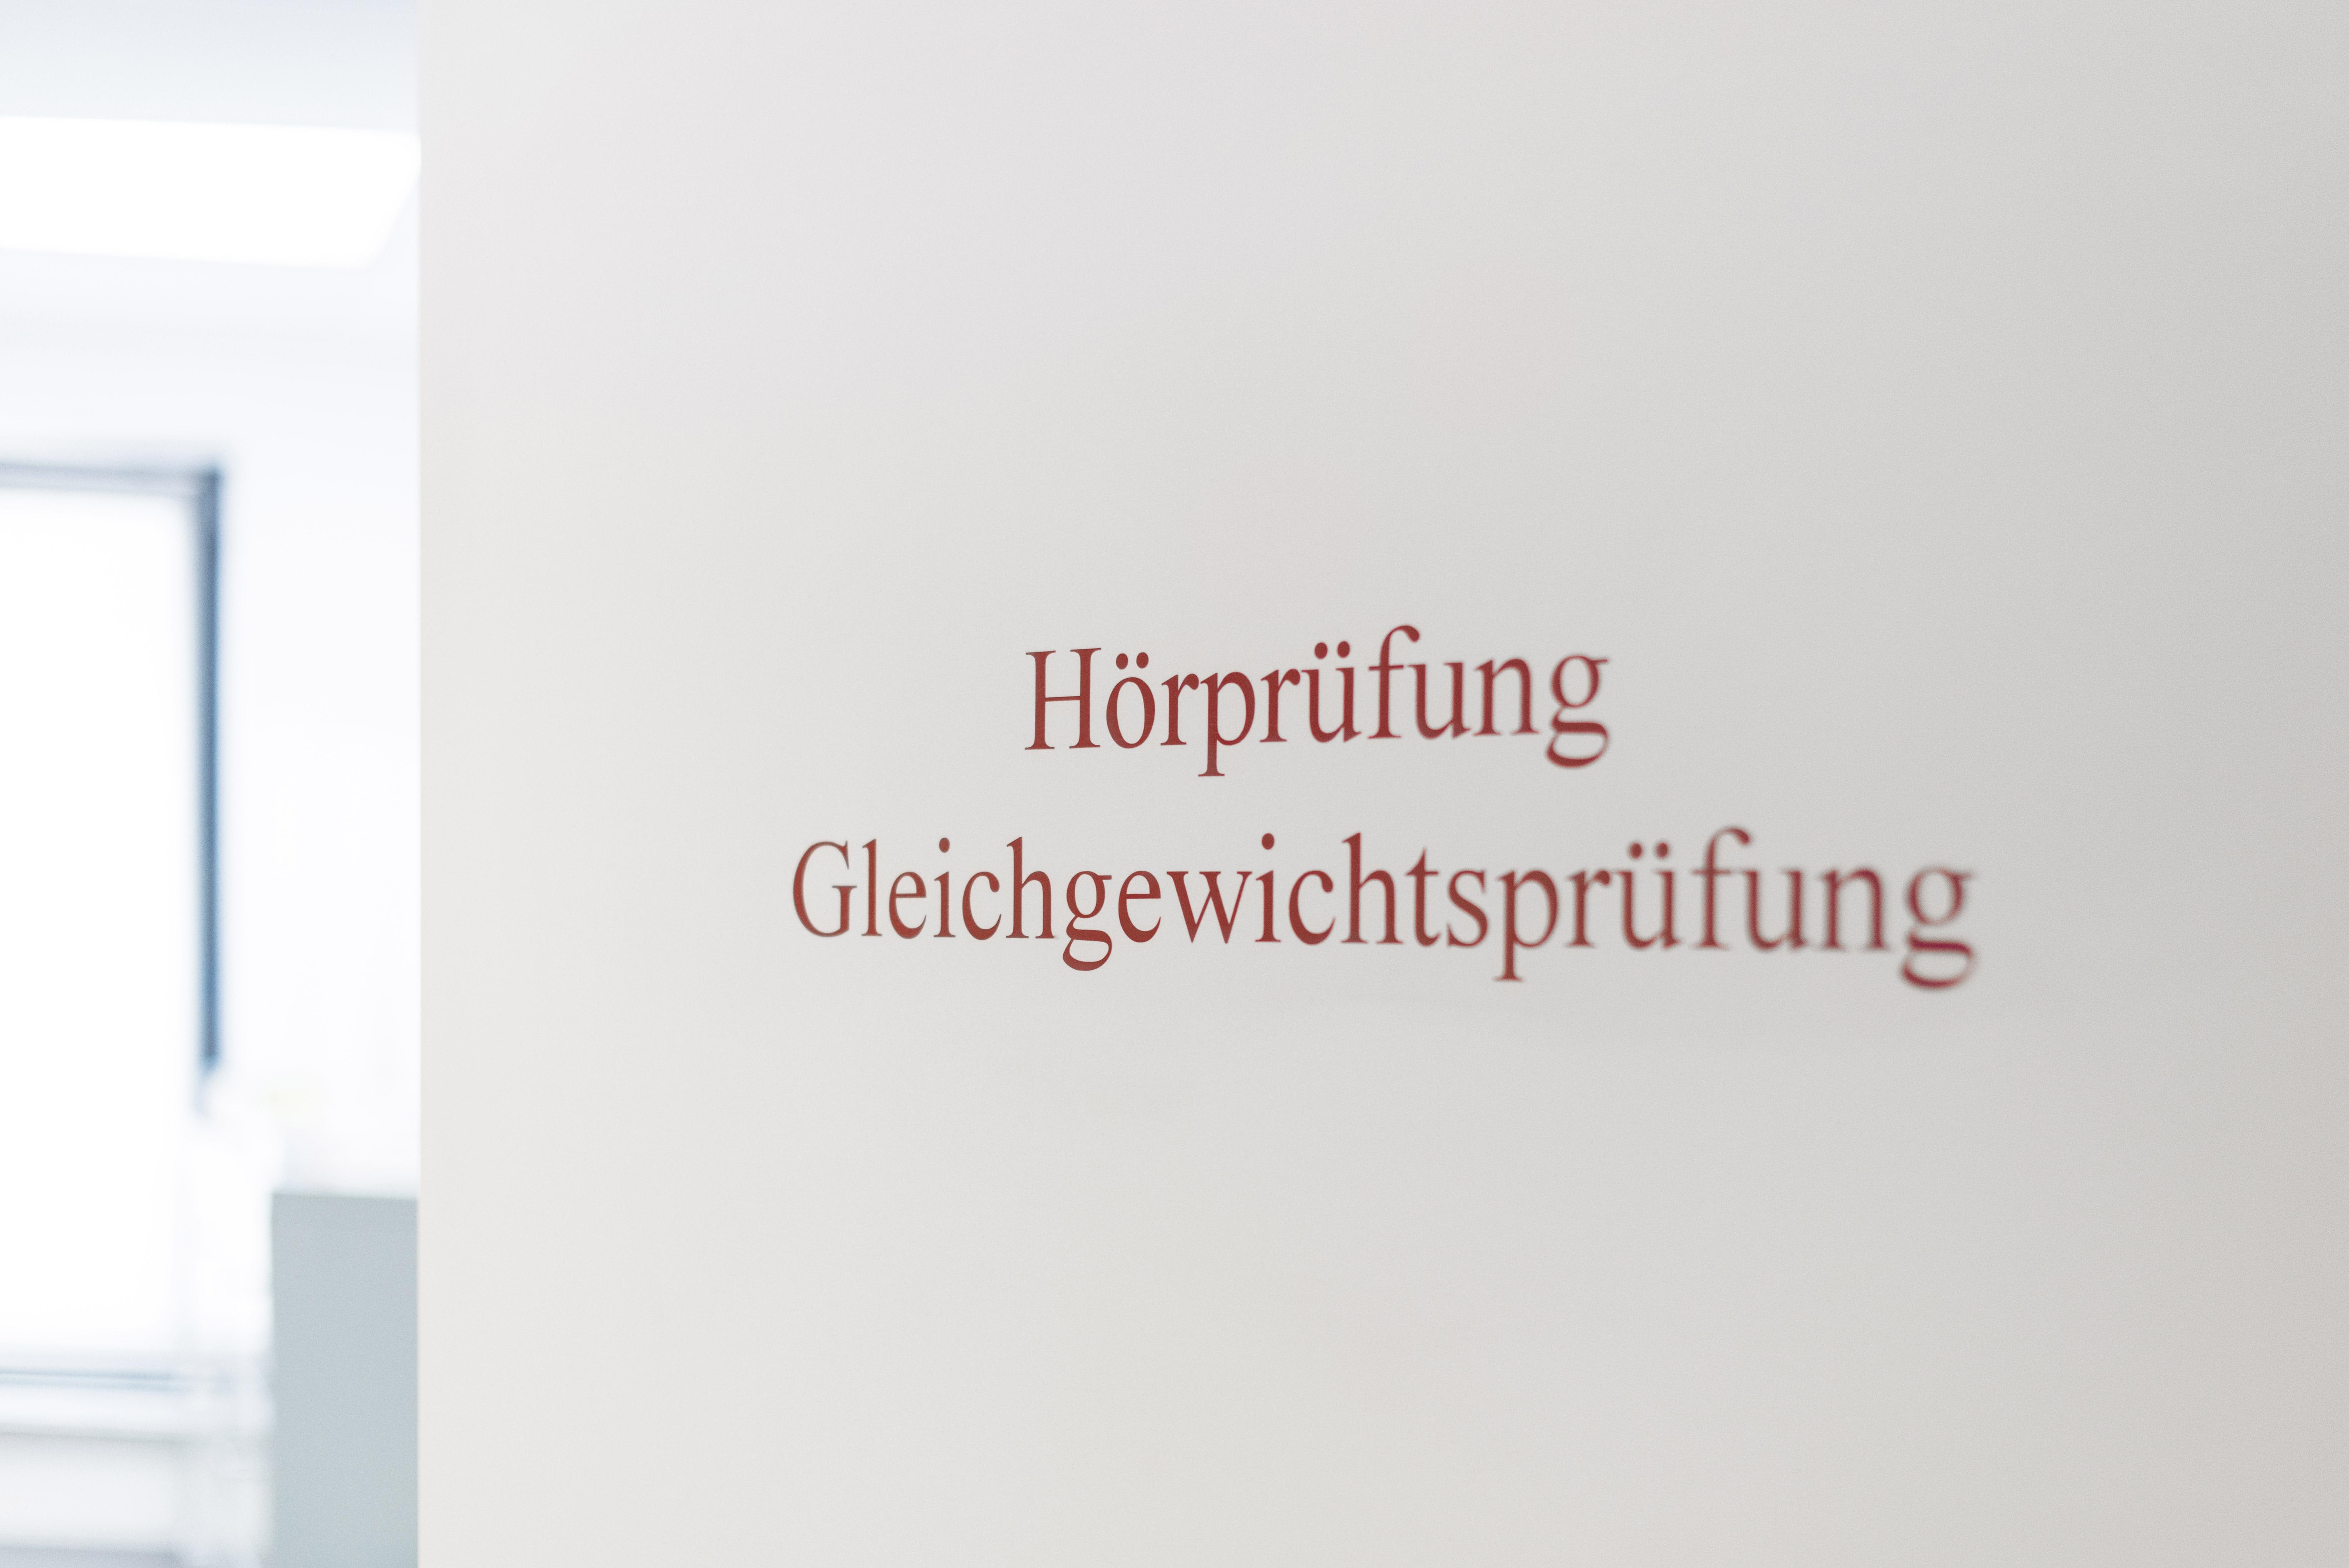 Hörprüfung HNO Praxis Bonn Duisdorf